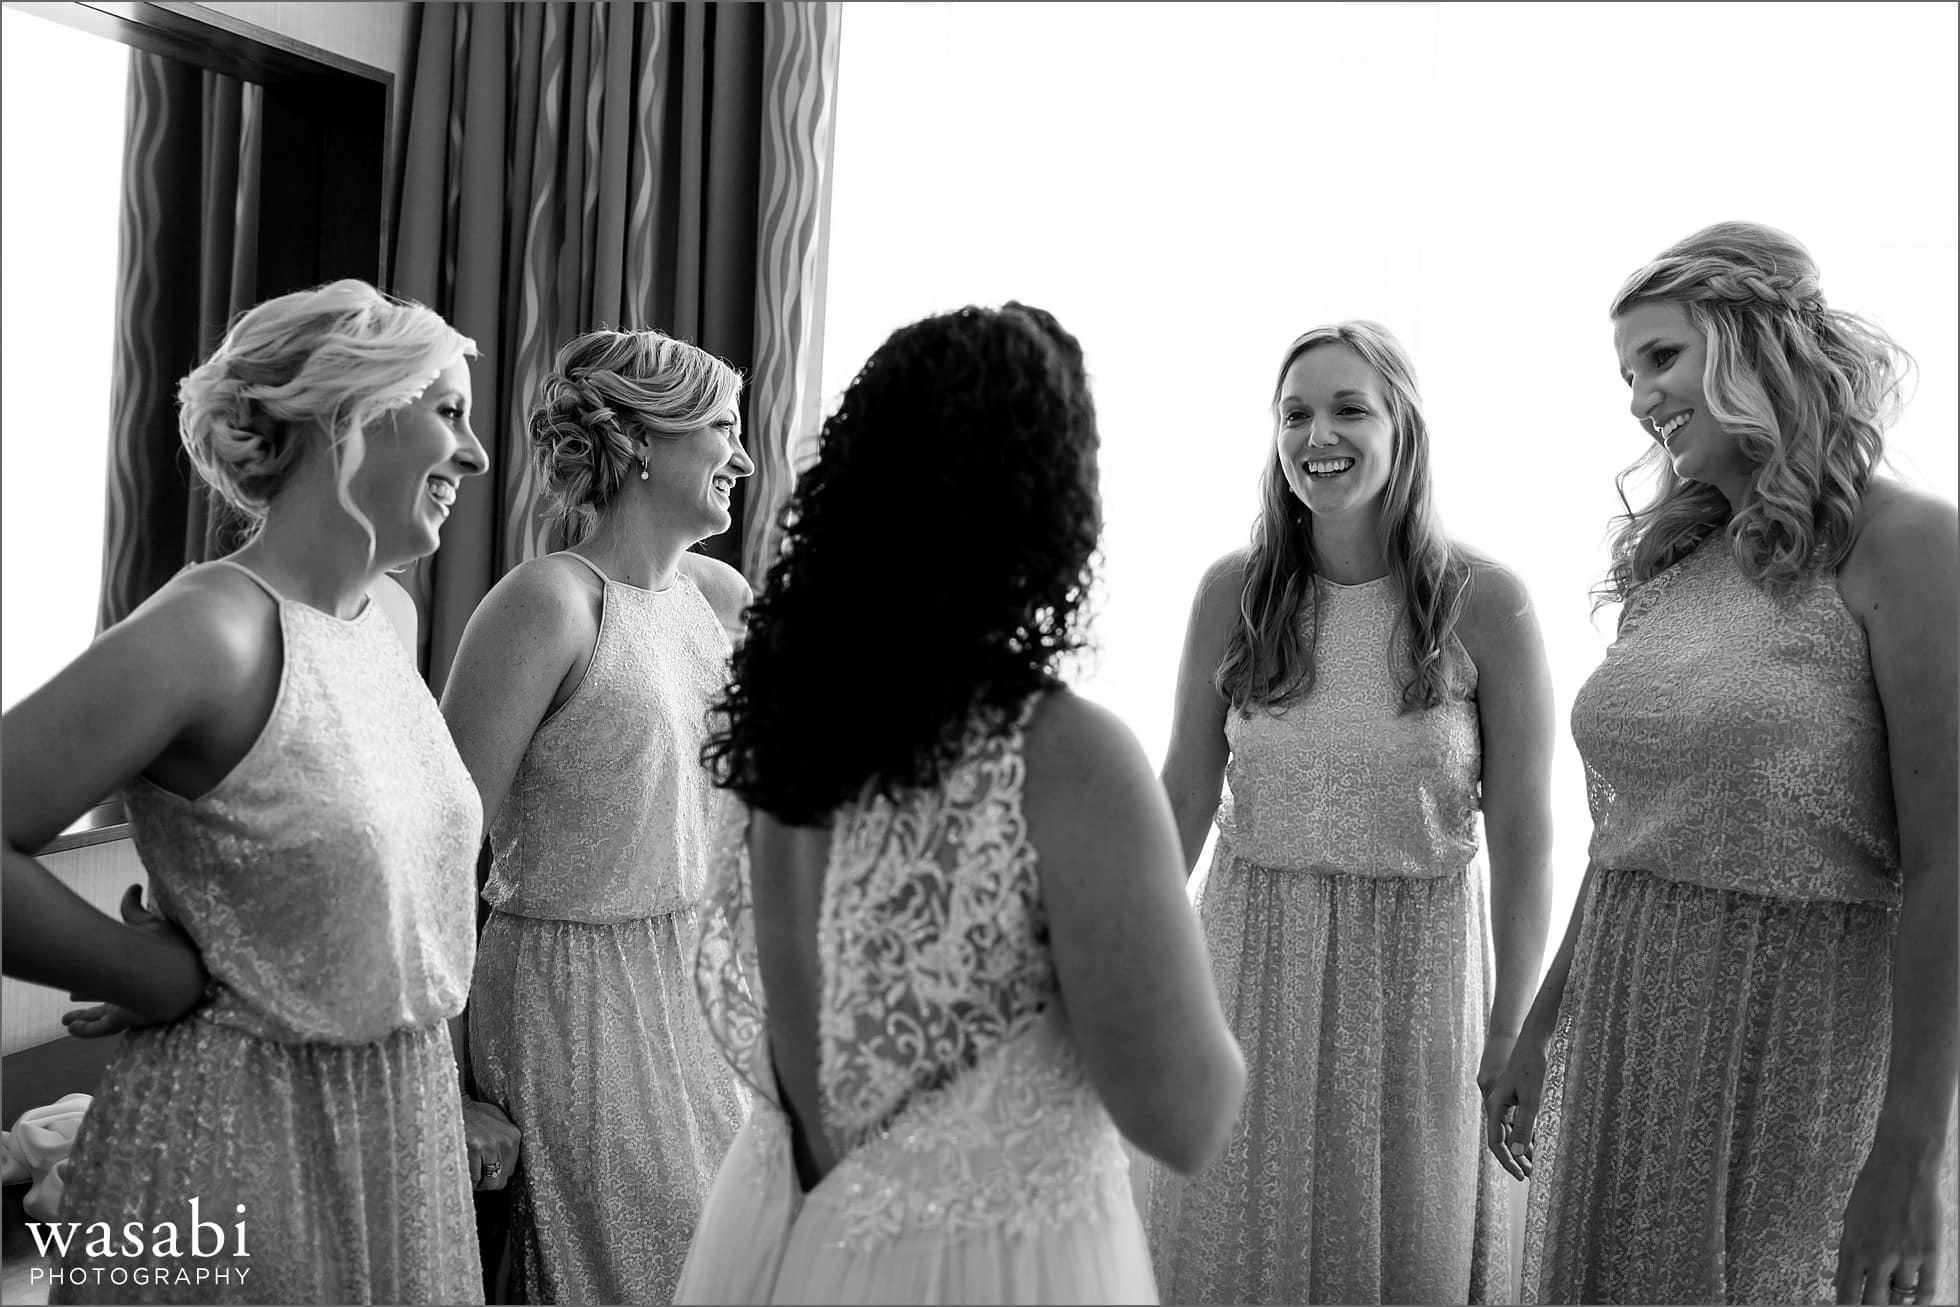 bridesmaids smile at bride while she puts on wedding dress at Lombard Westin Hotel